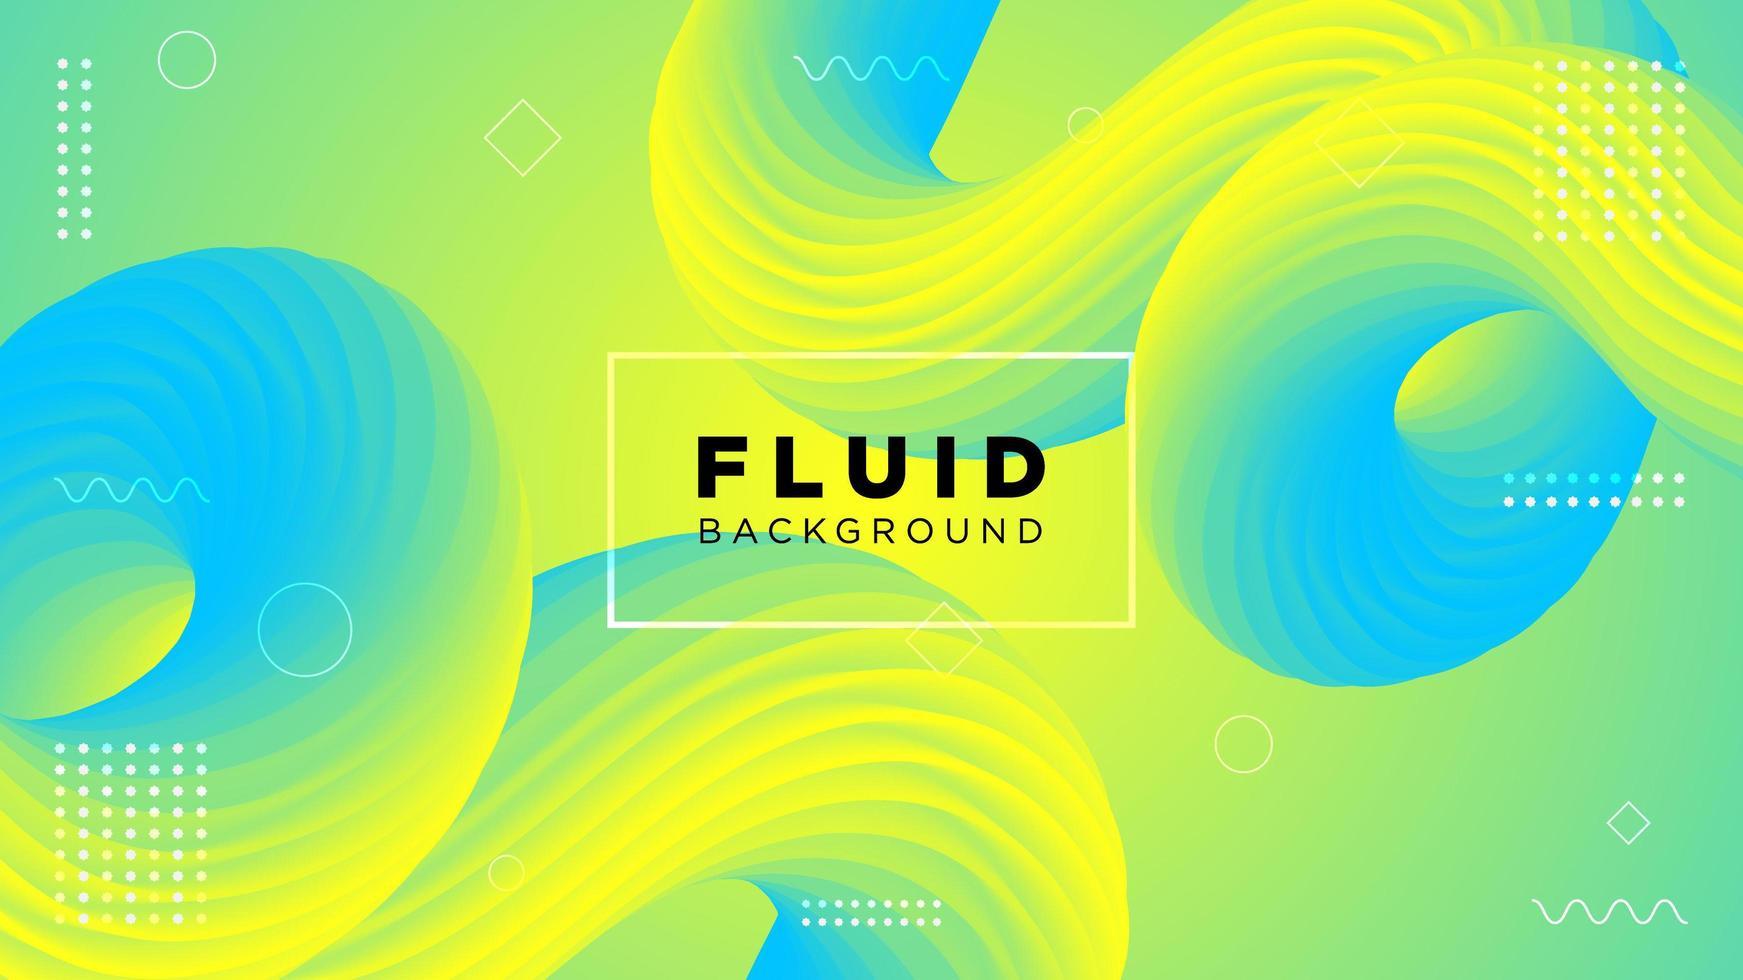 Movimiento moderno fondo degradado fluido vector